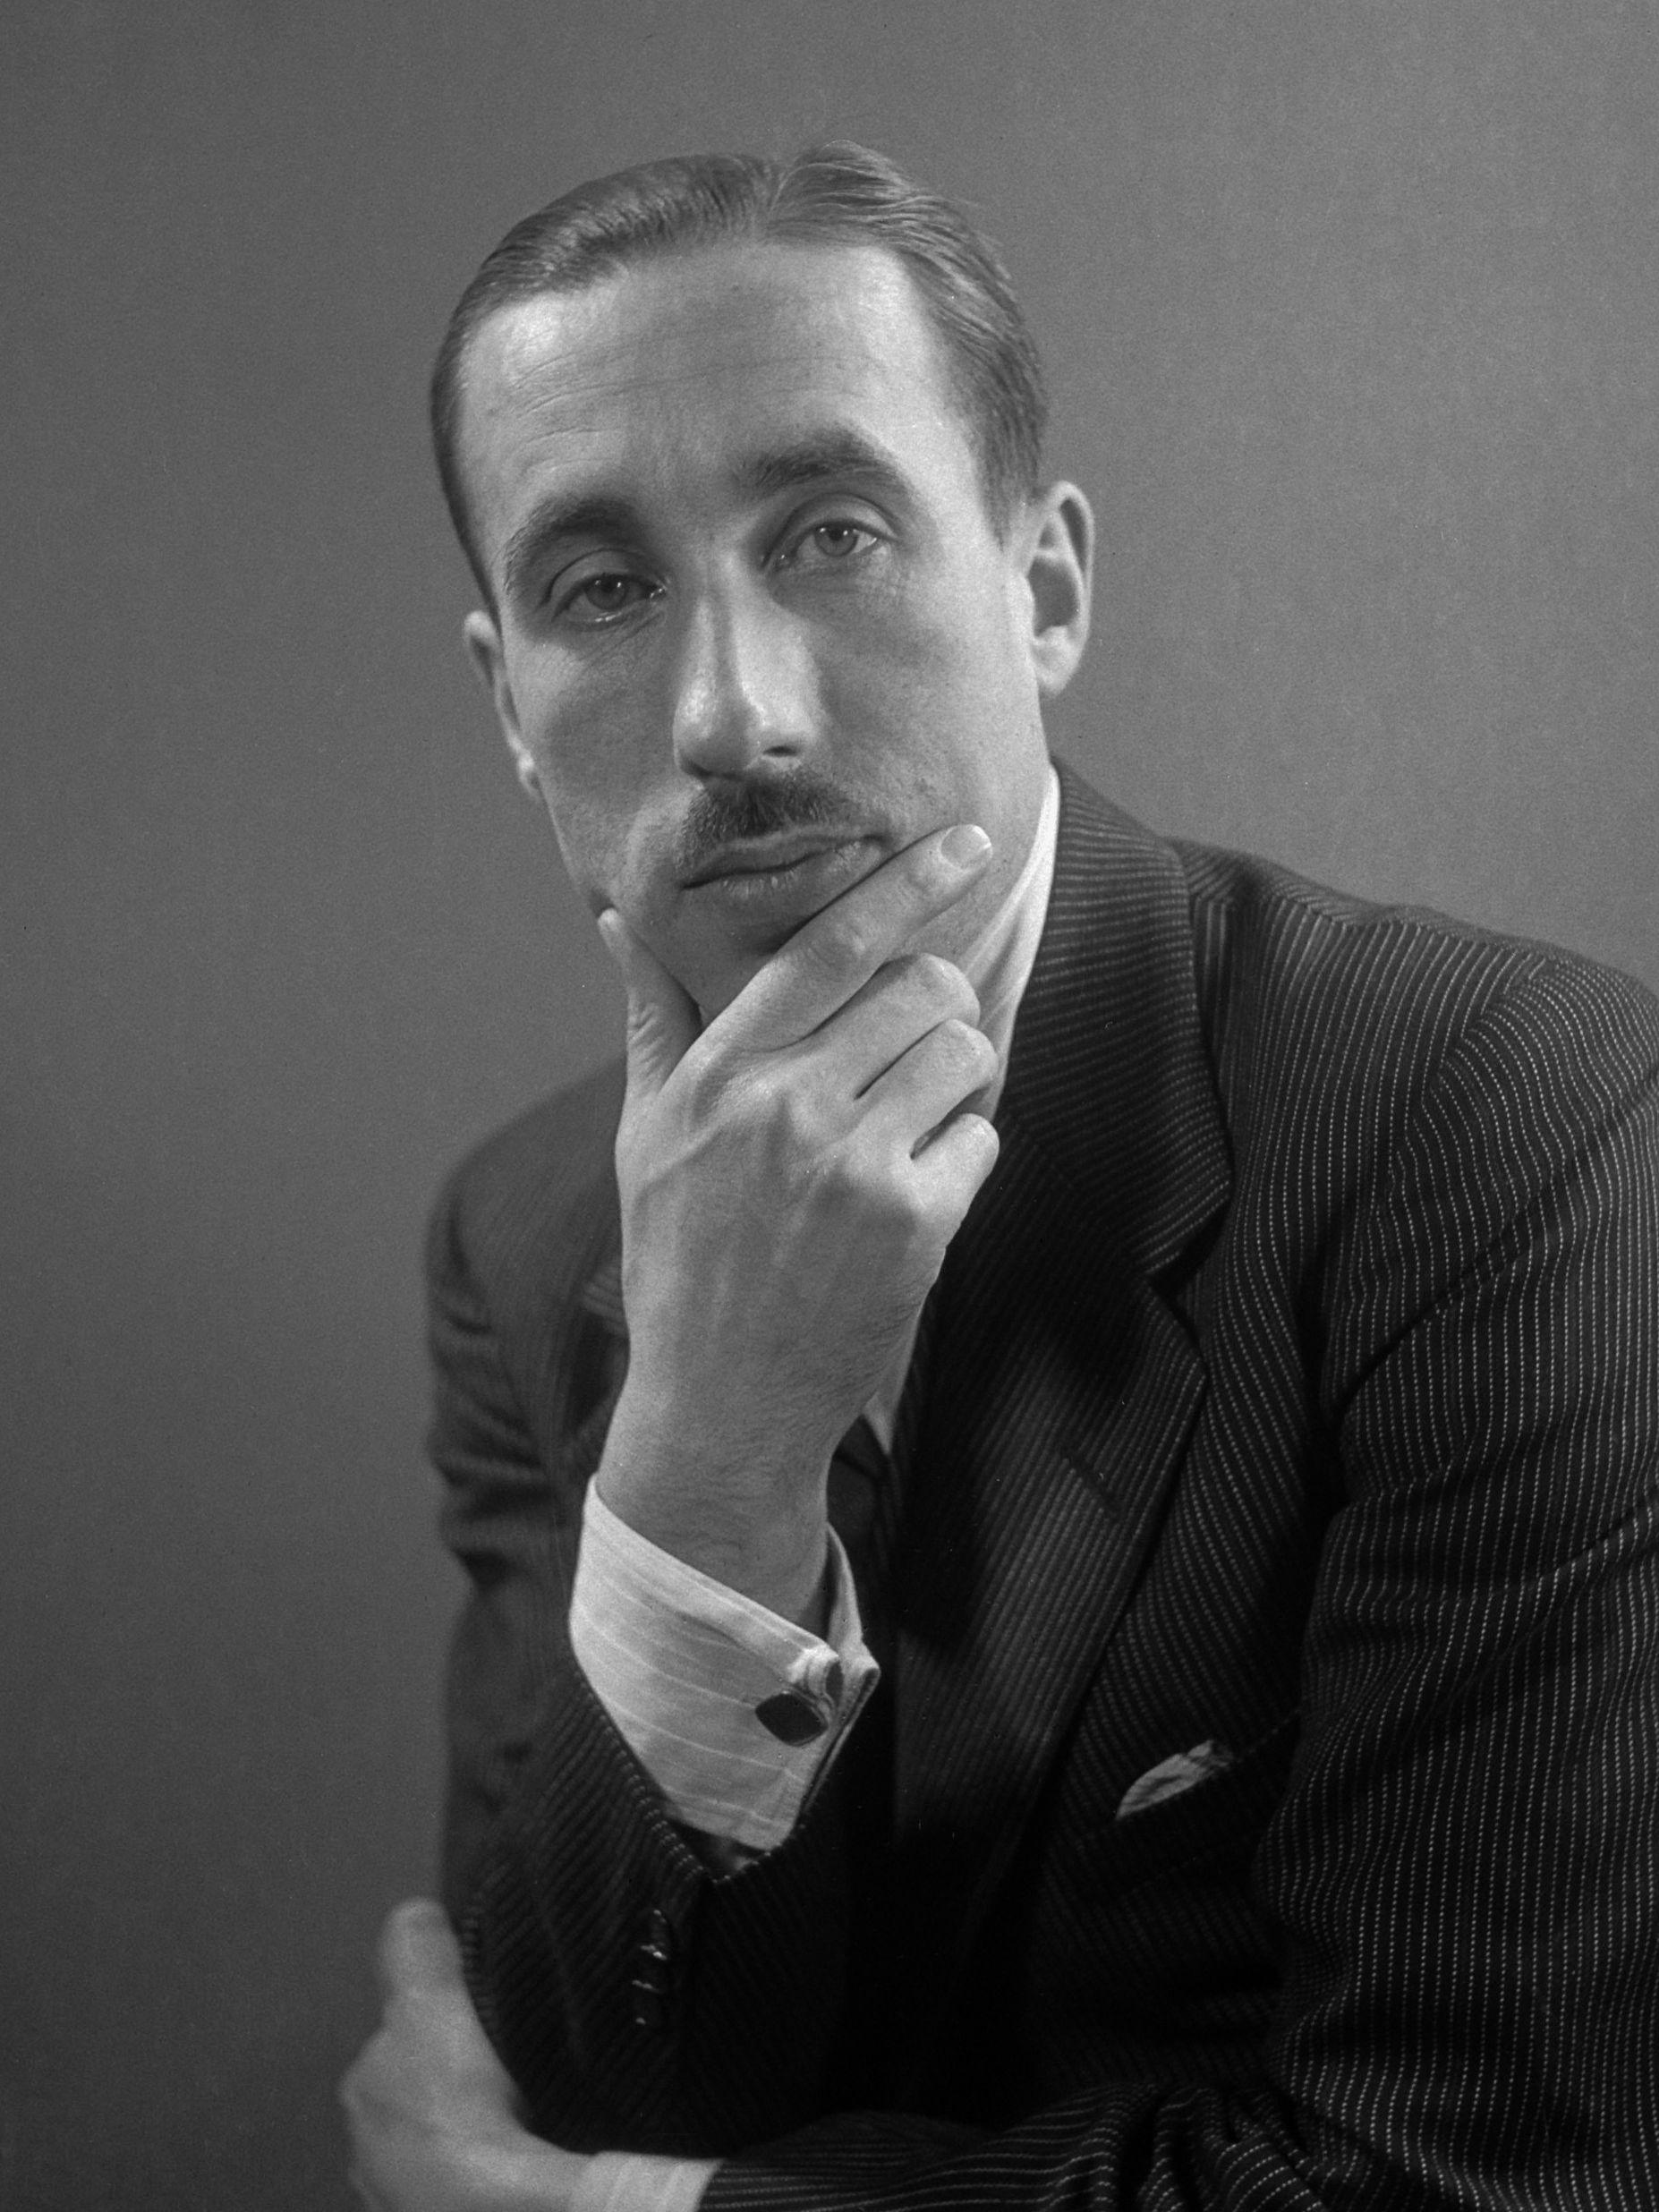 Leonhard Huizinga (1906-1980) in 1945.